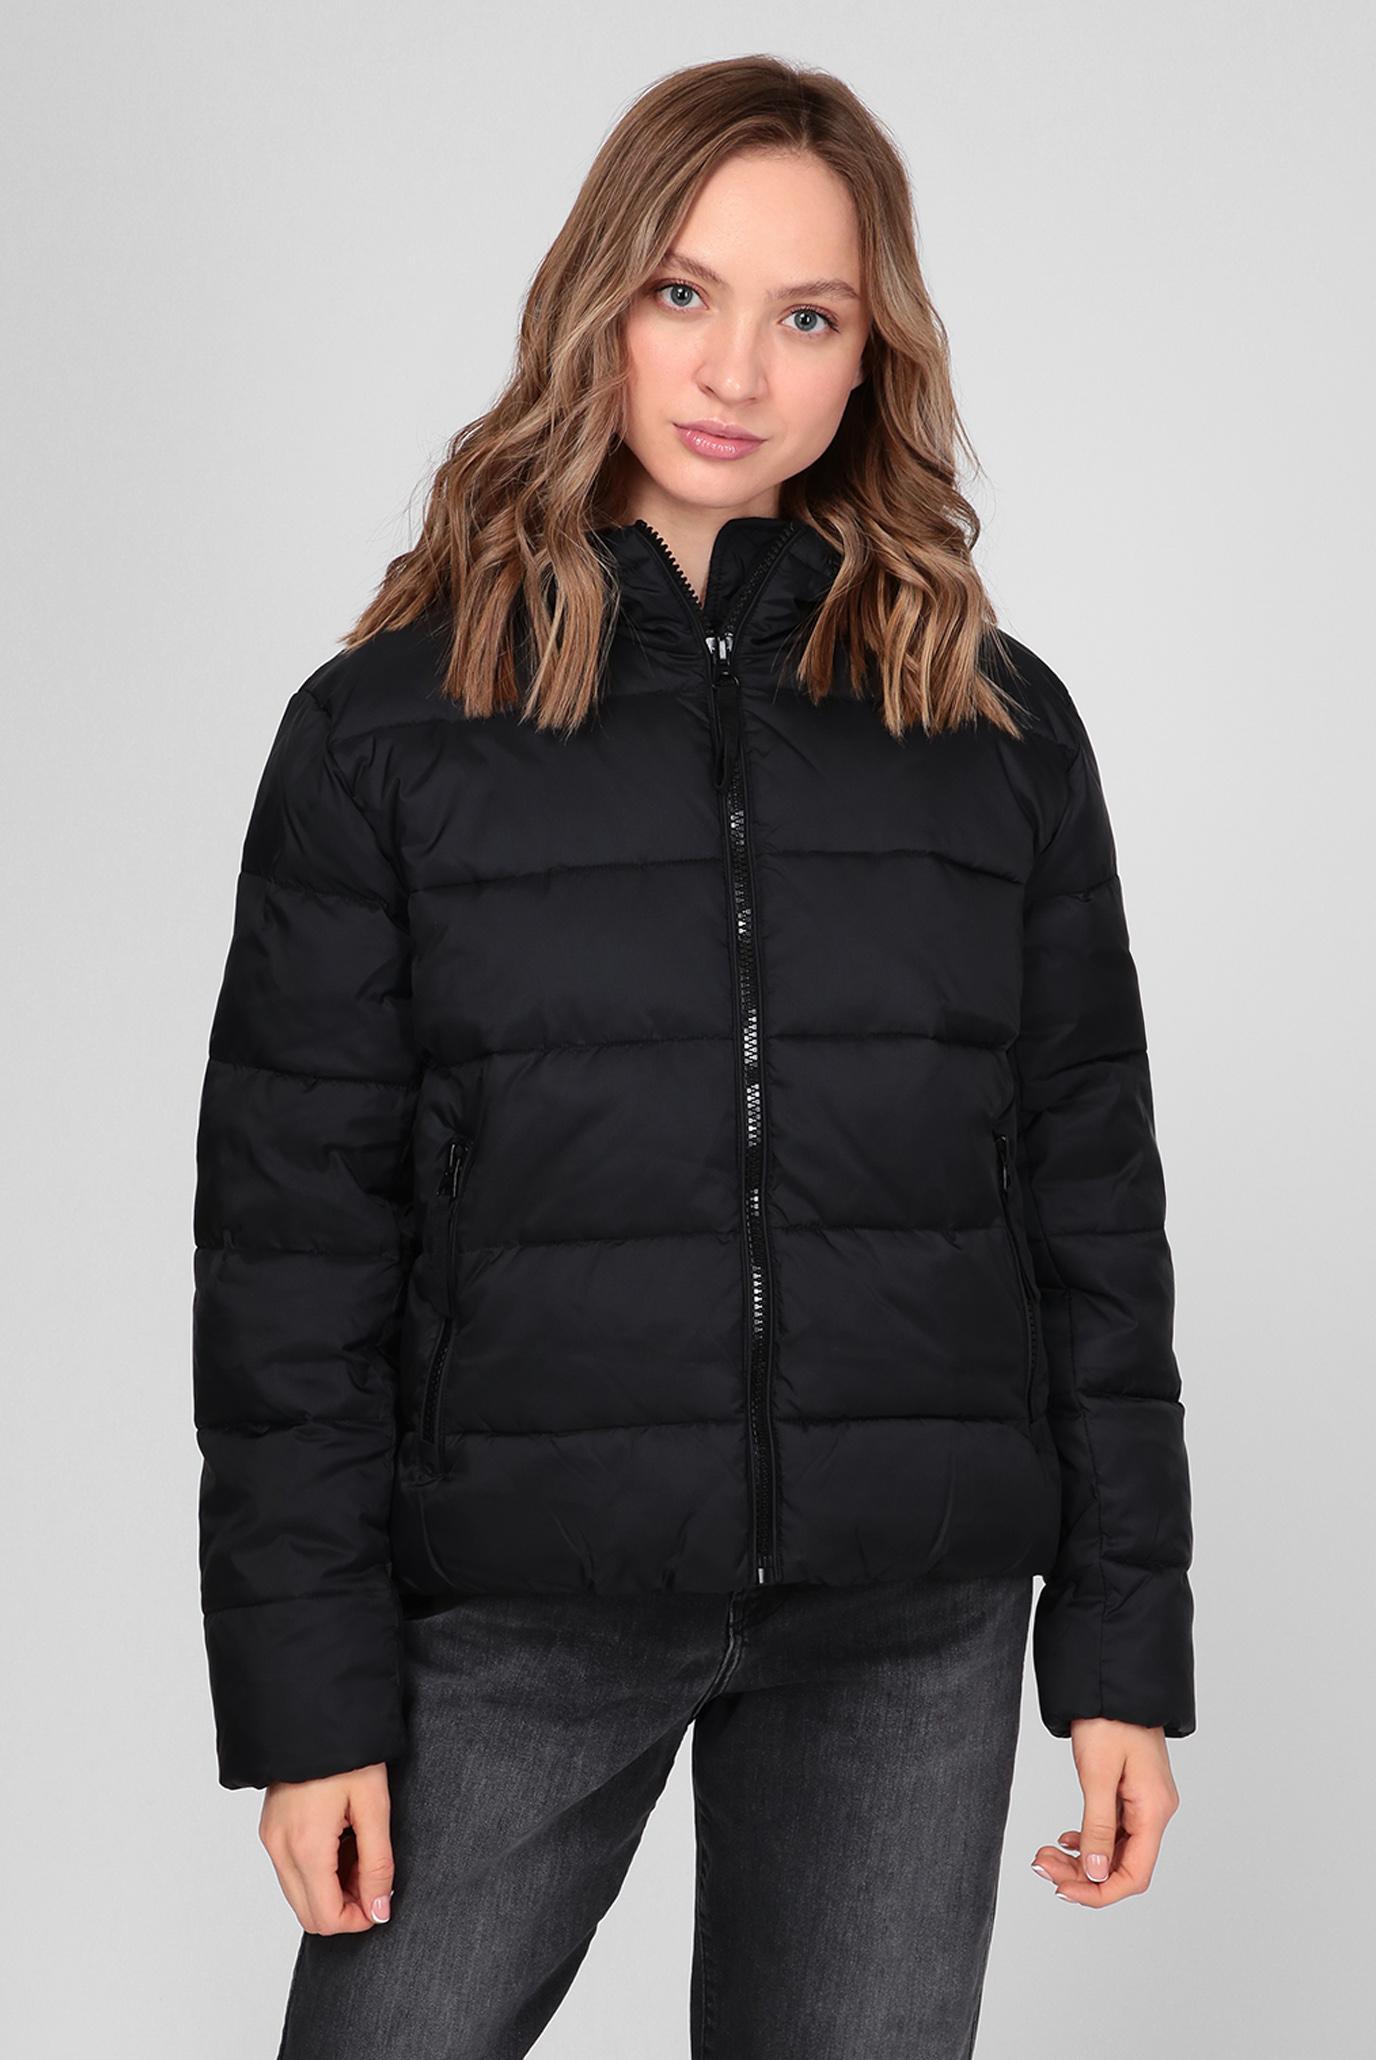 Жіноча чорна куртка FLORENCIA 1